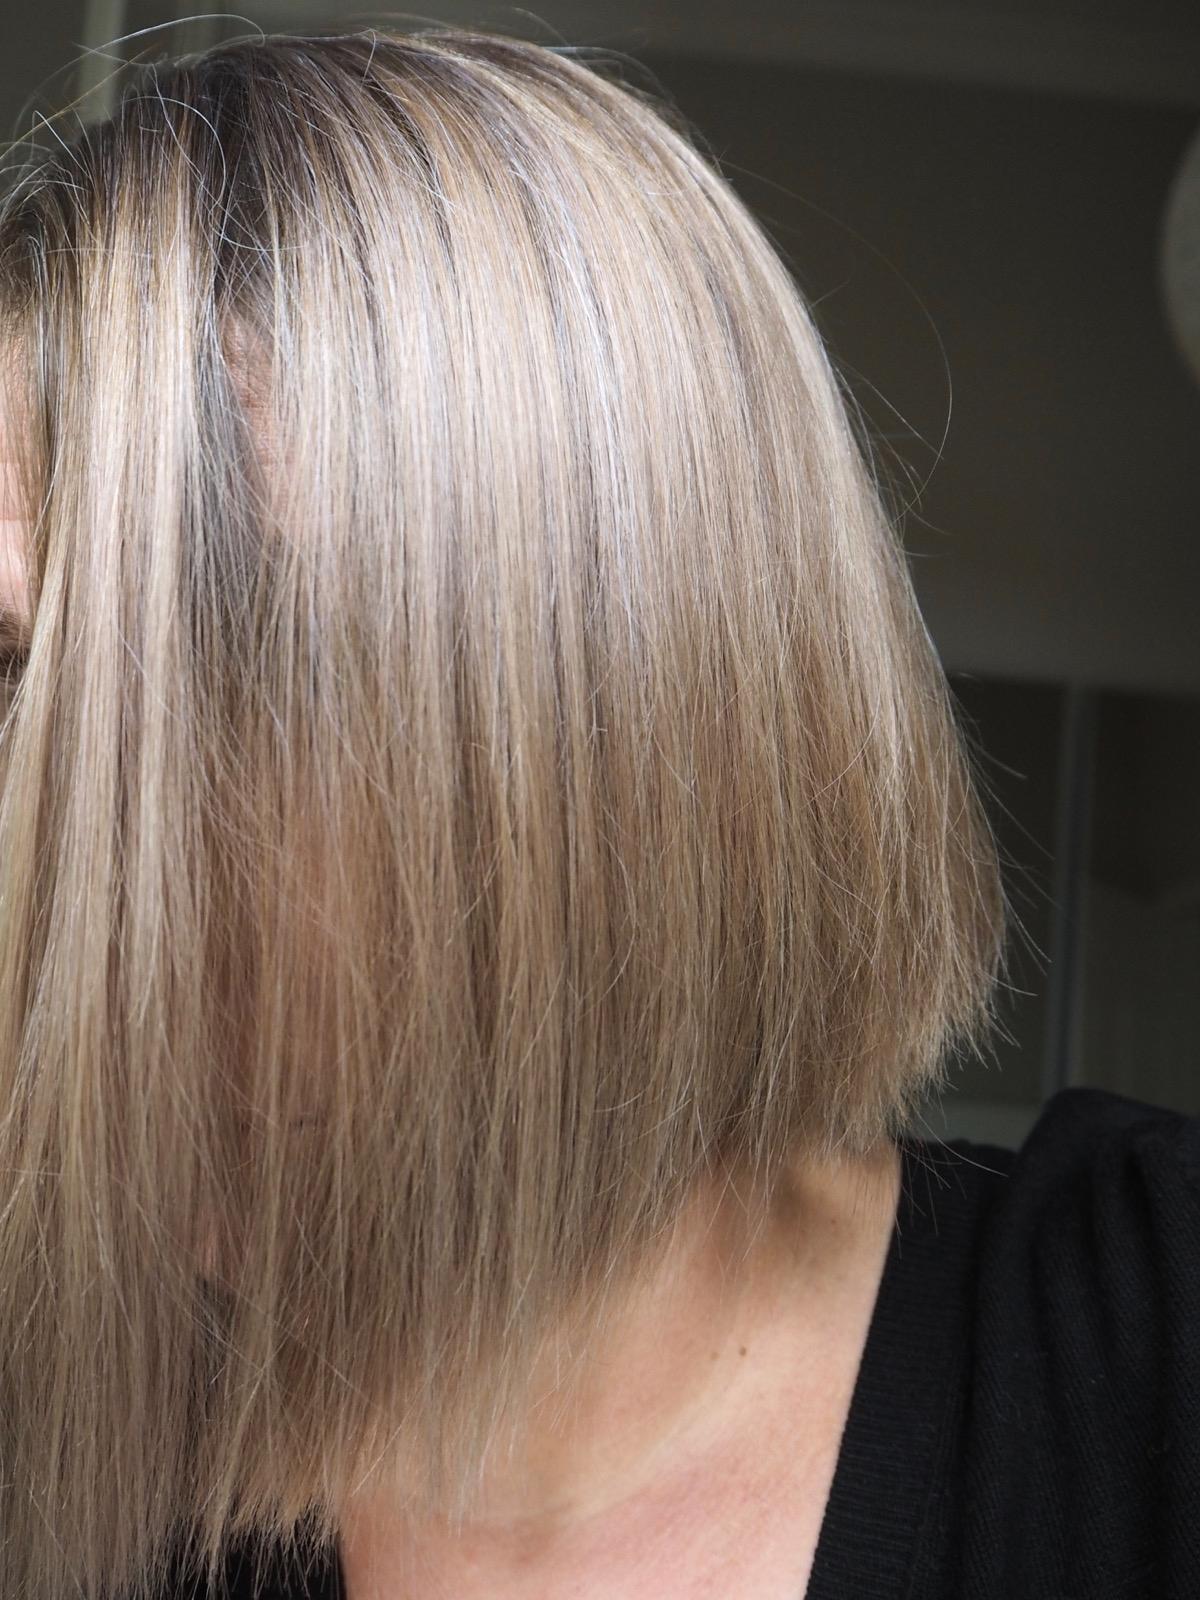 Graue Haare September 2019